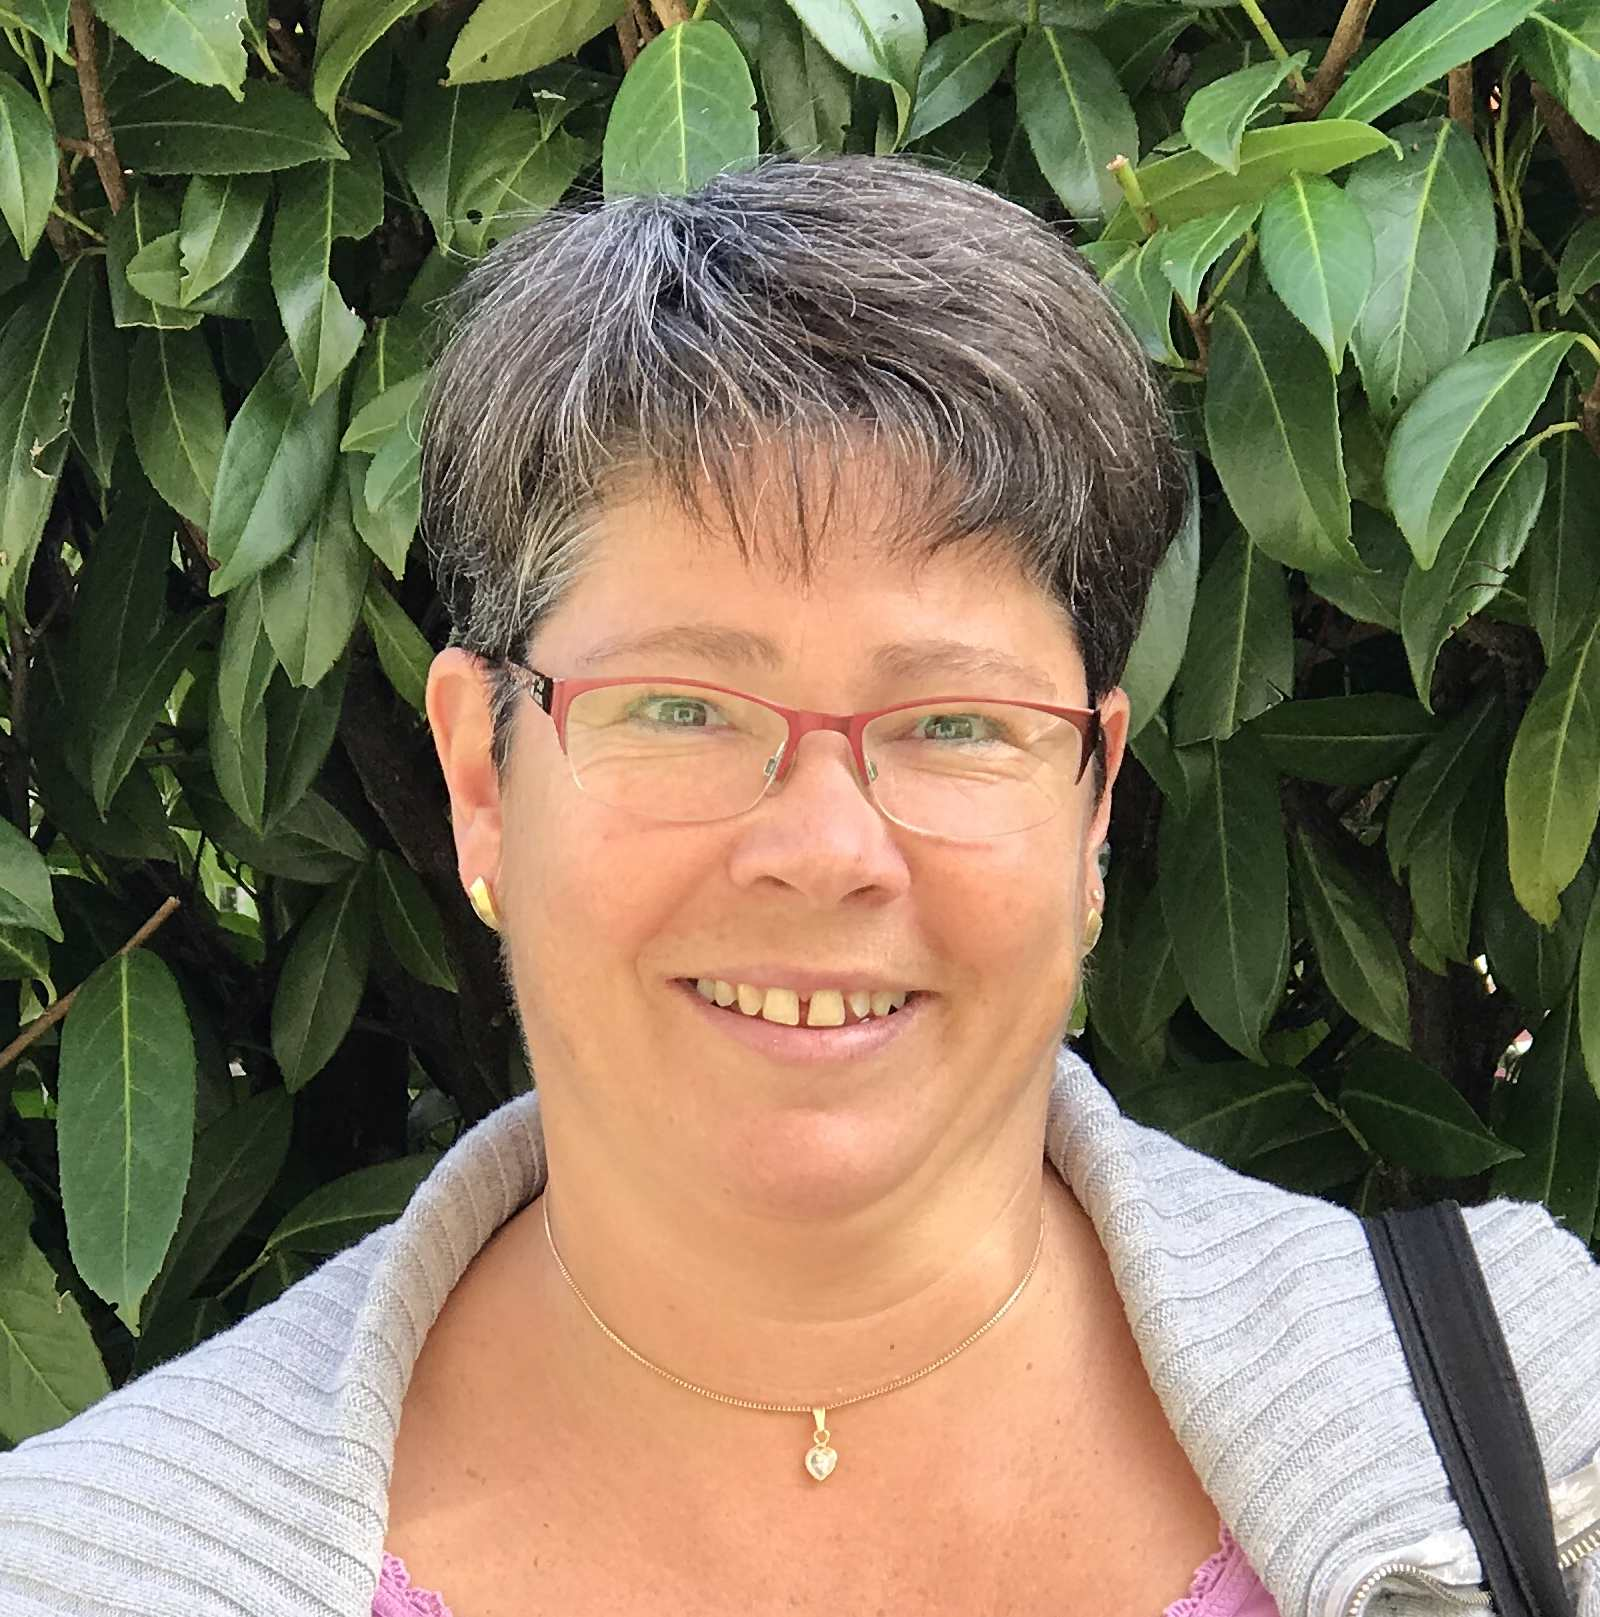 Silvia Mazzier - Hüftoperation abgesagt